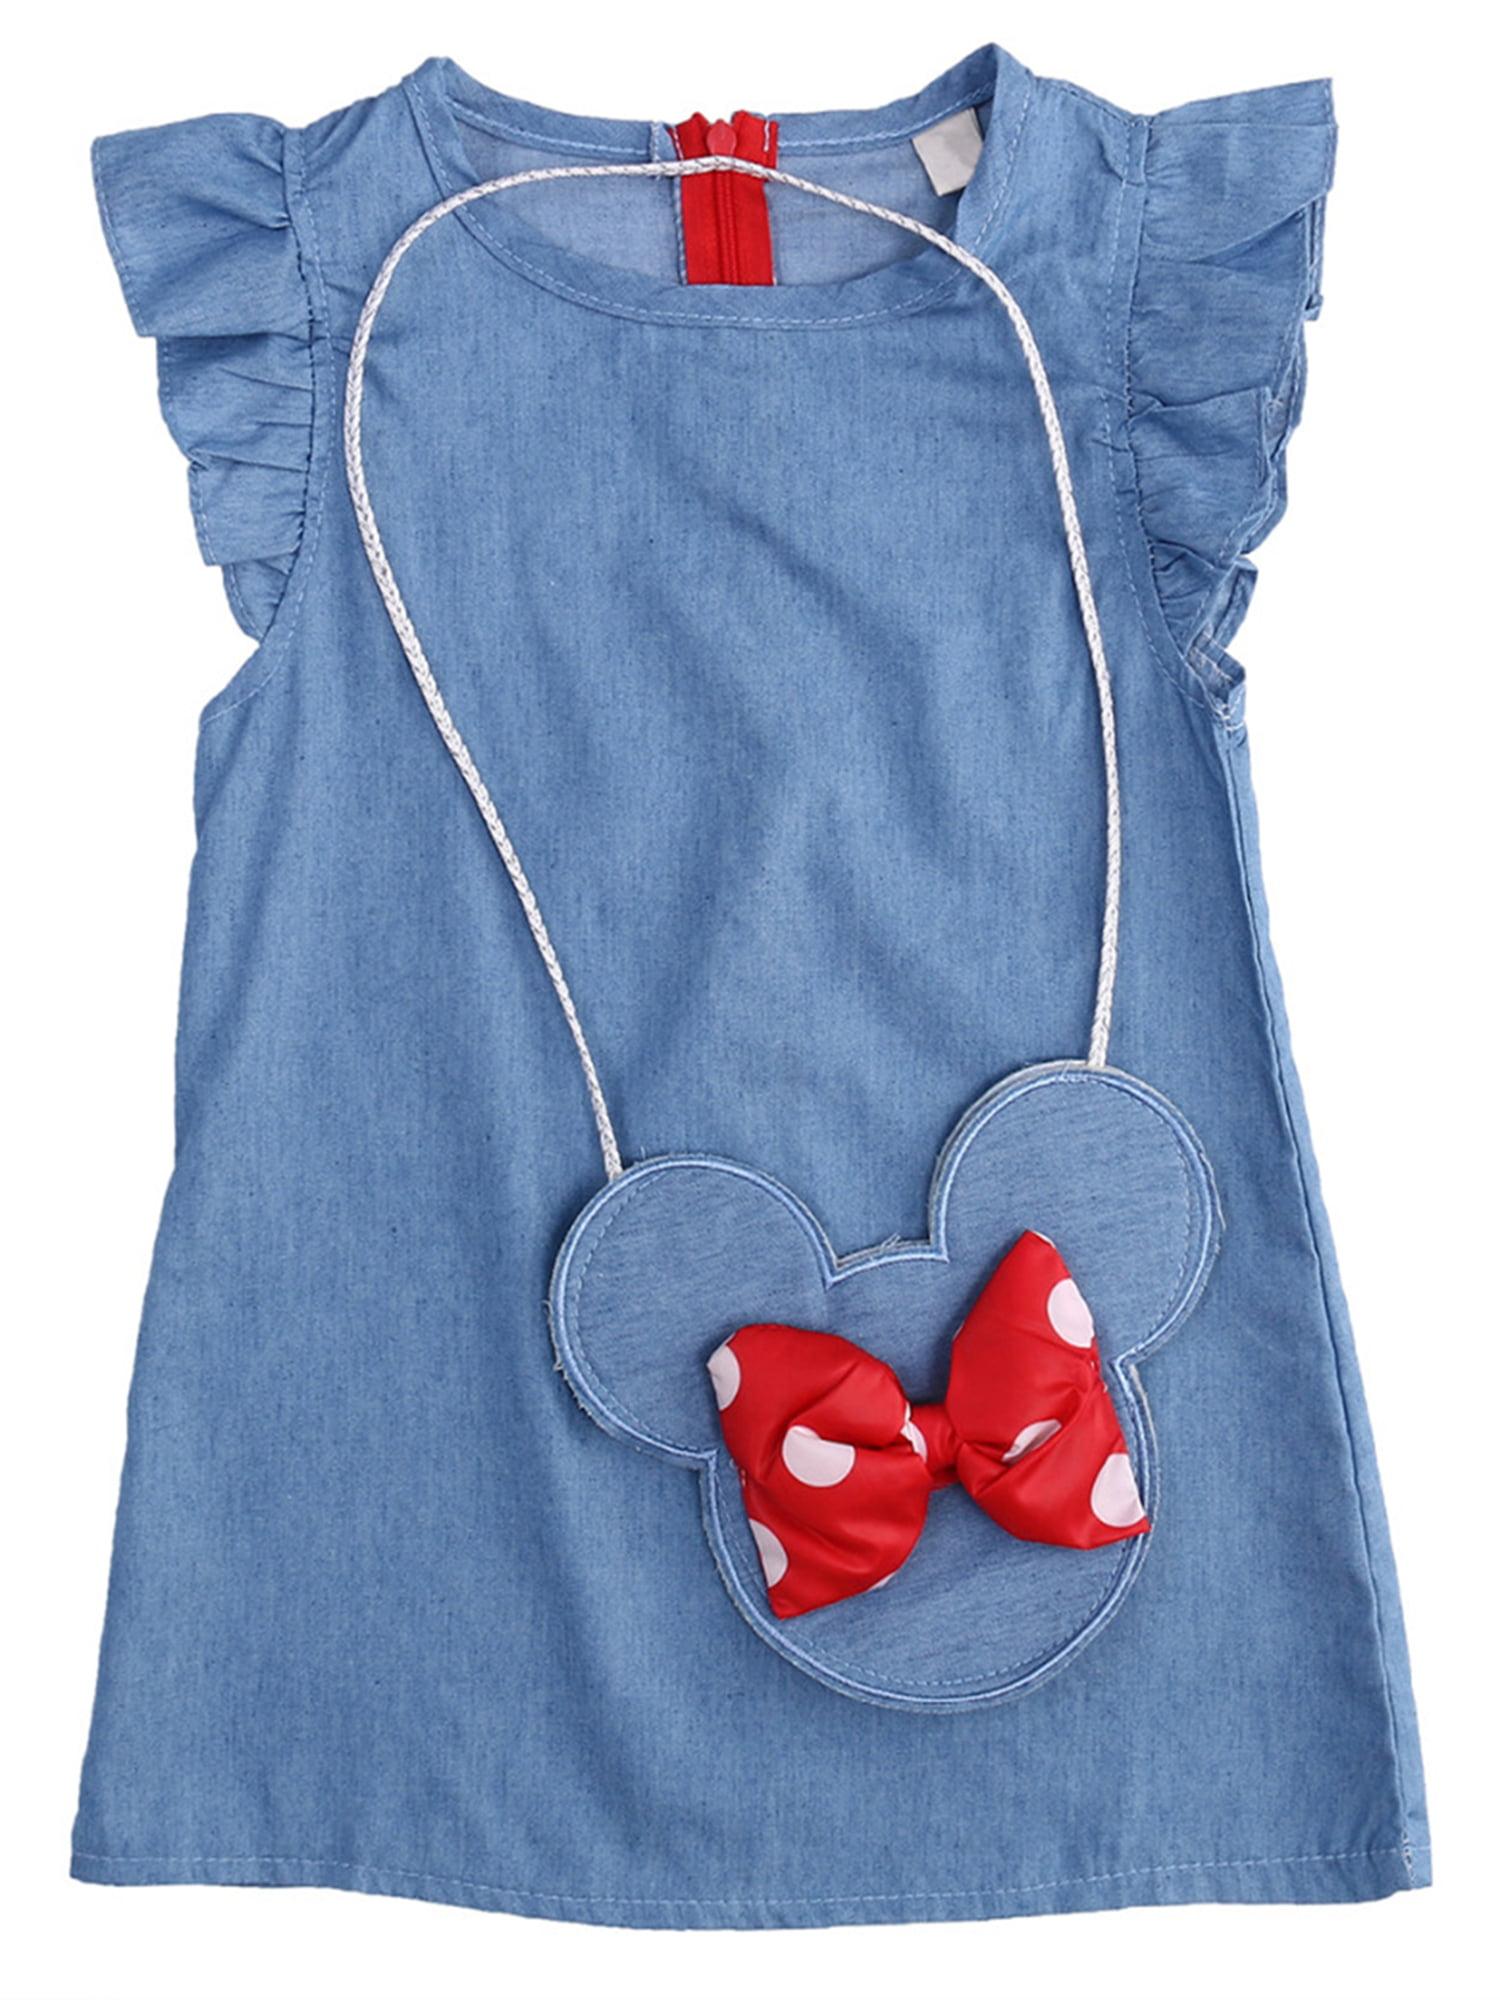 StylesILove Baby Girl Ruffle Sleeve Shabby Denim Dress with Coin Bag 2 pcs Set (100/4T)